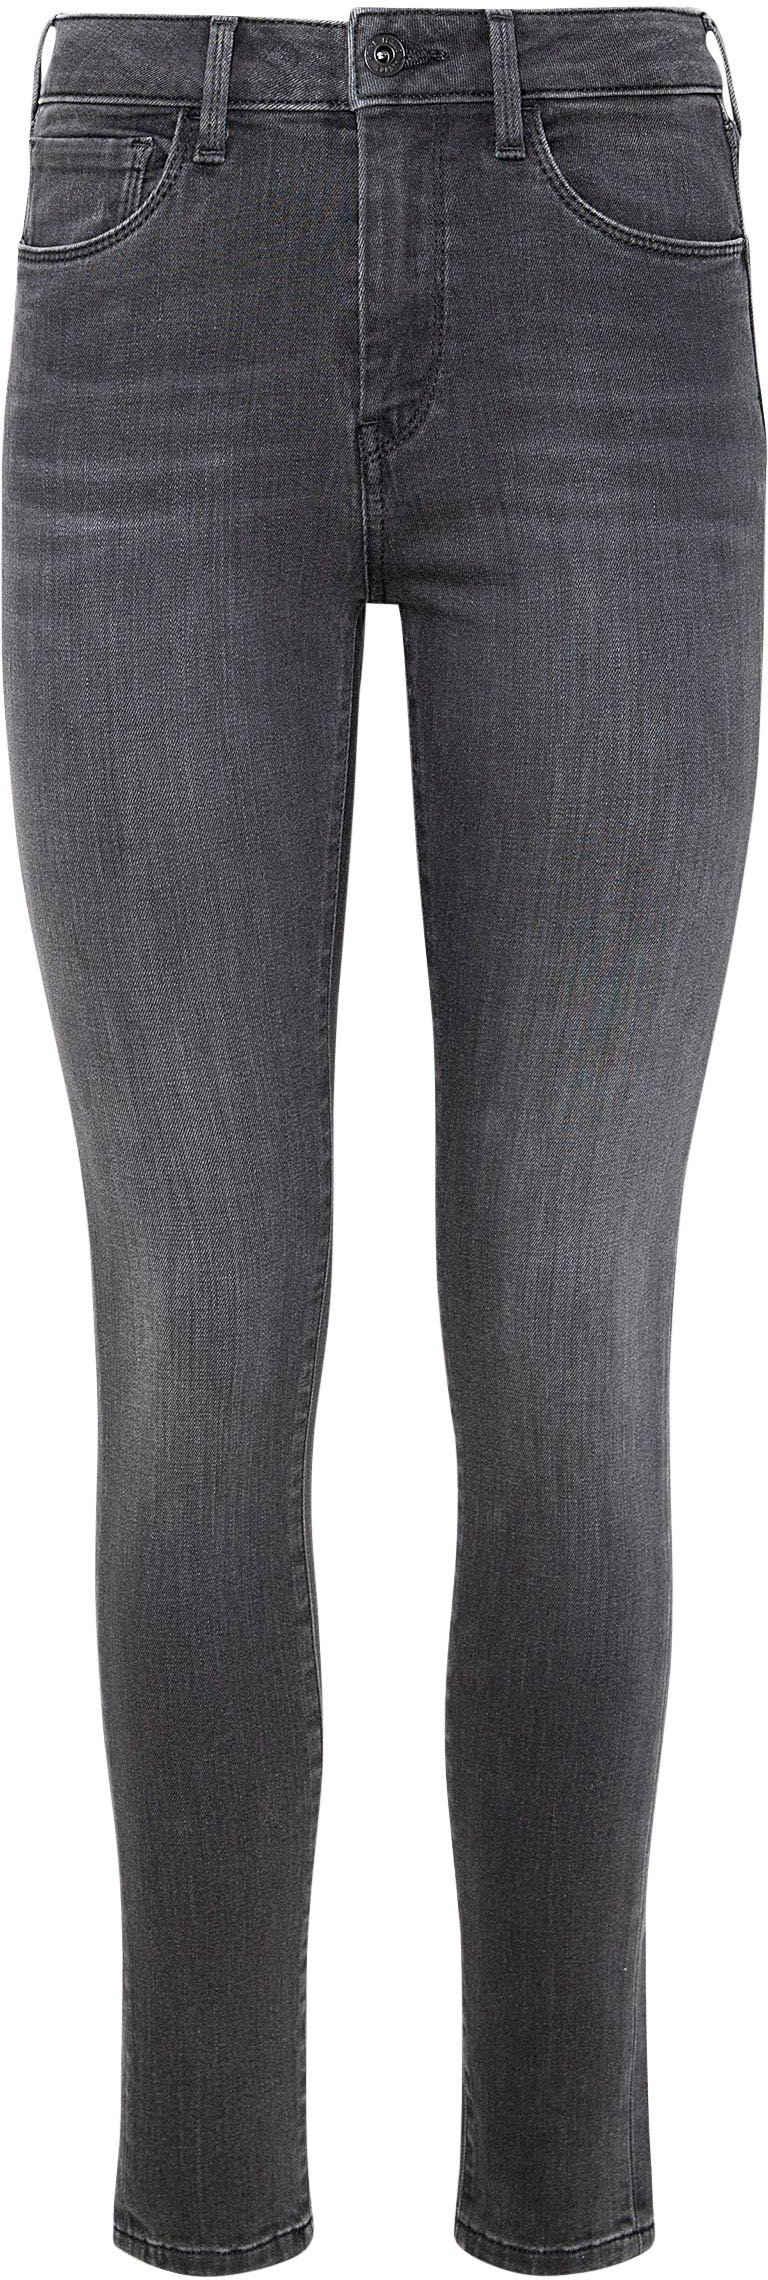 Pepe Jeans Röhrenjeans »REGENT« Skinny Passform mit hohem Bund in seidig bequemem Stretch Denim